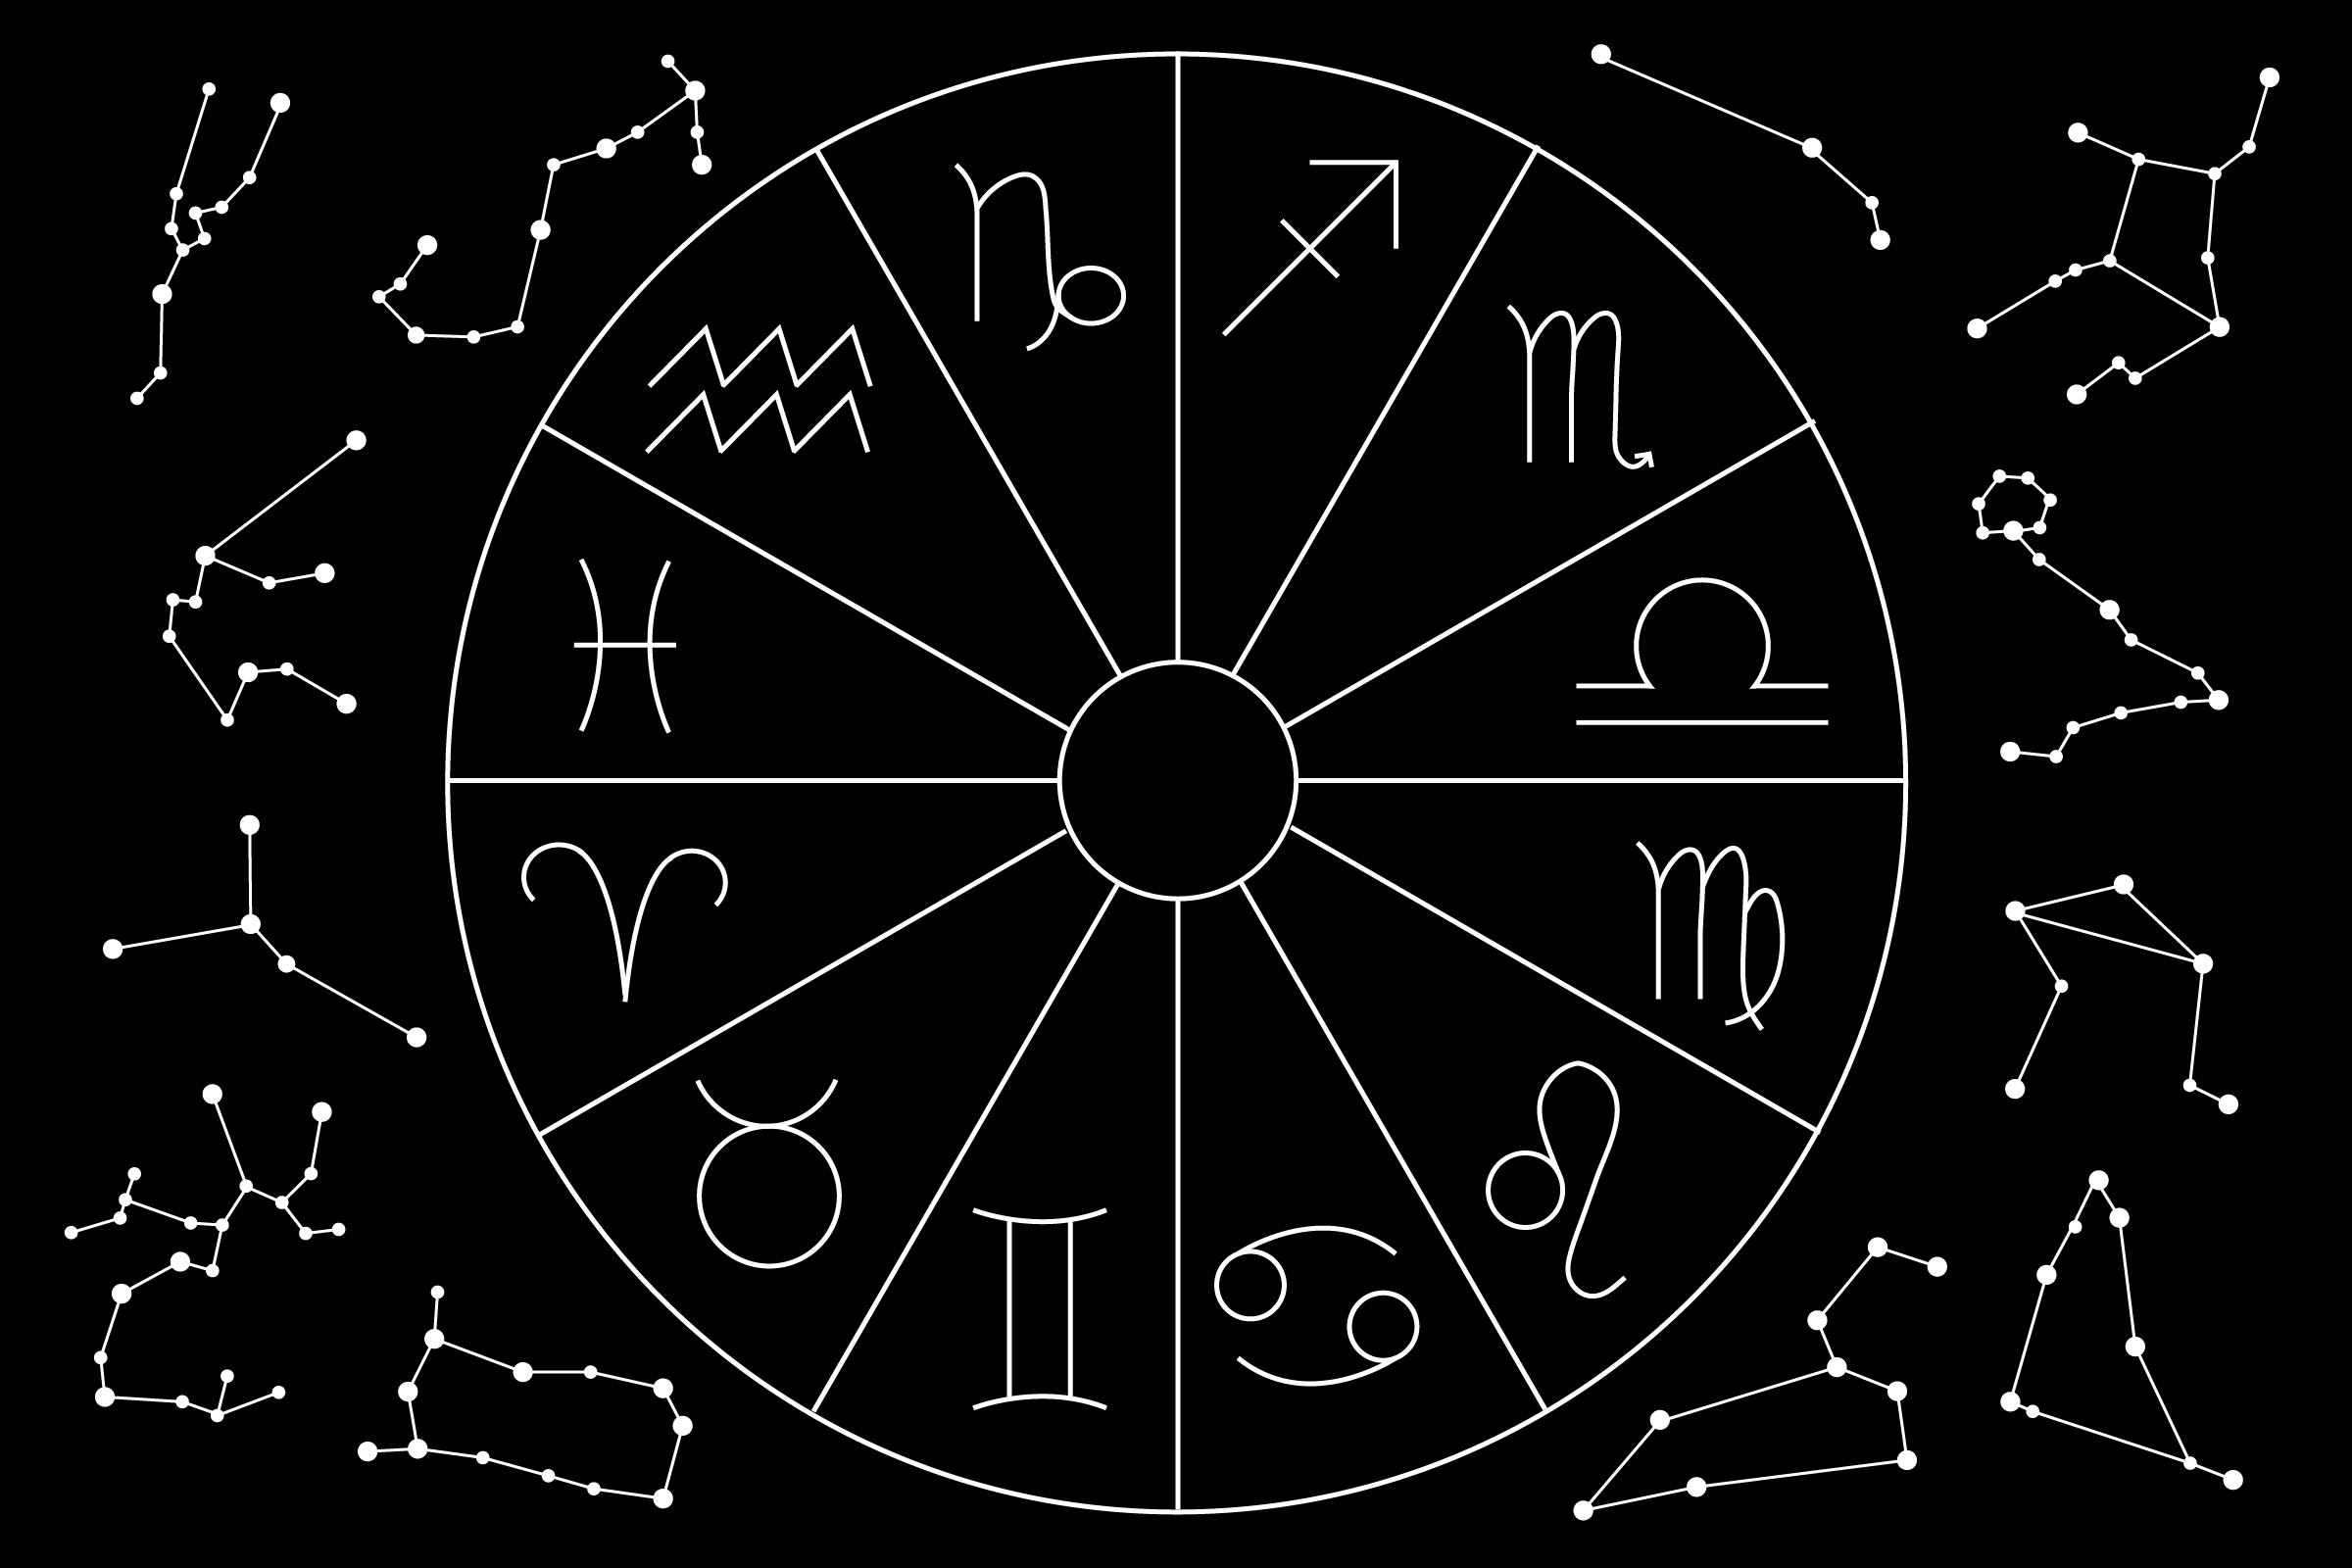 Zodiacs and Mercury retrograde: communication & confusion for 9/21-9/27 - The Michigan Daily